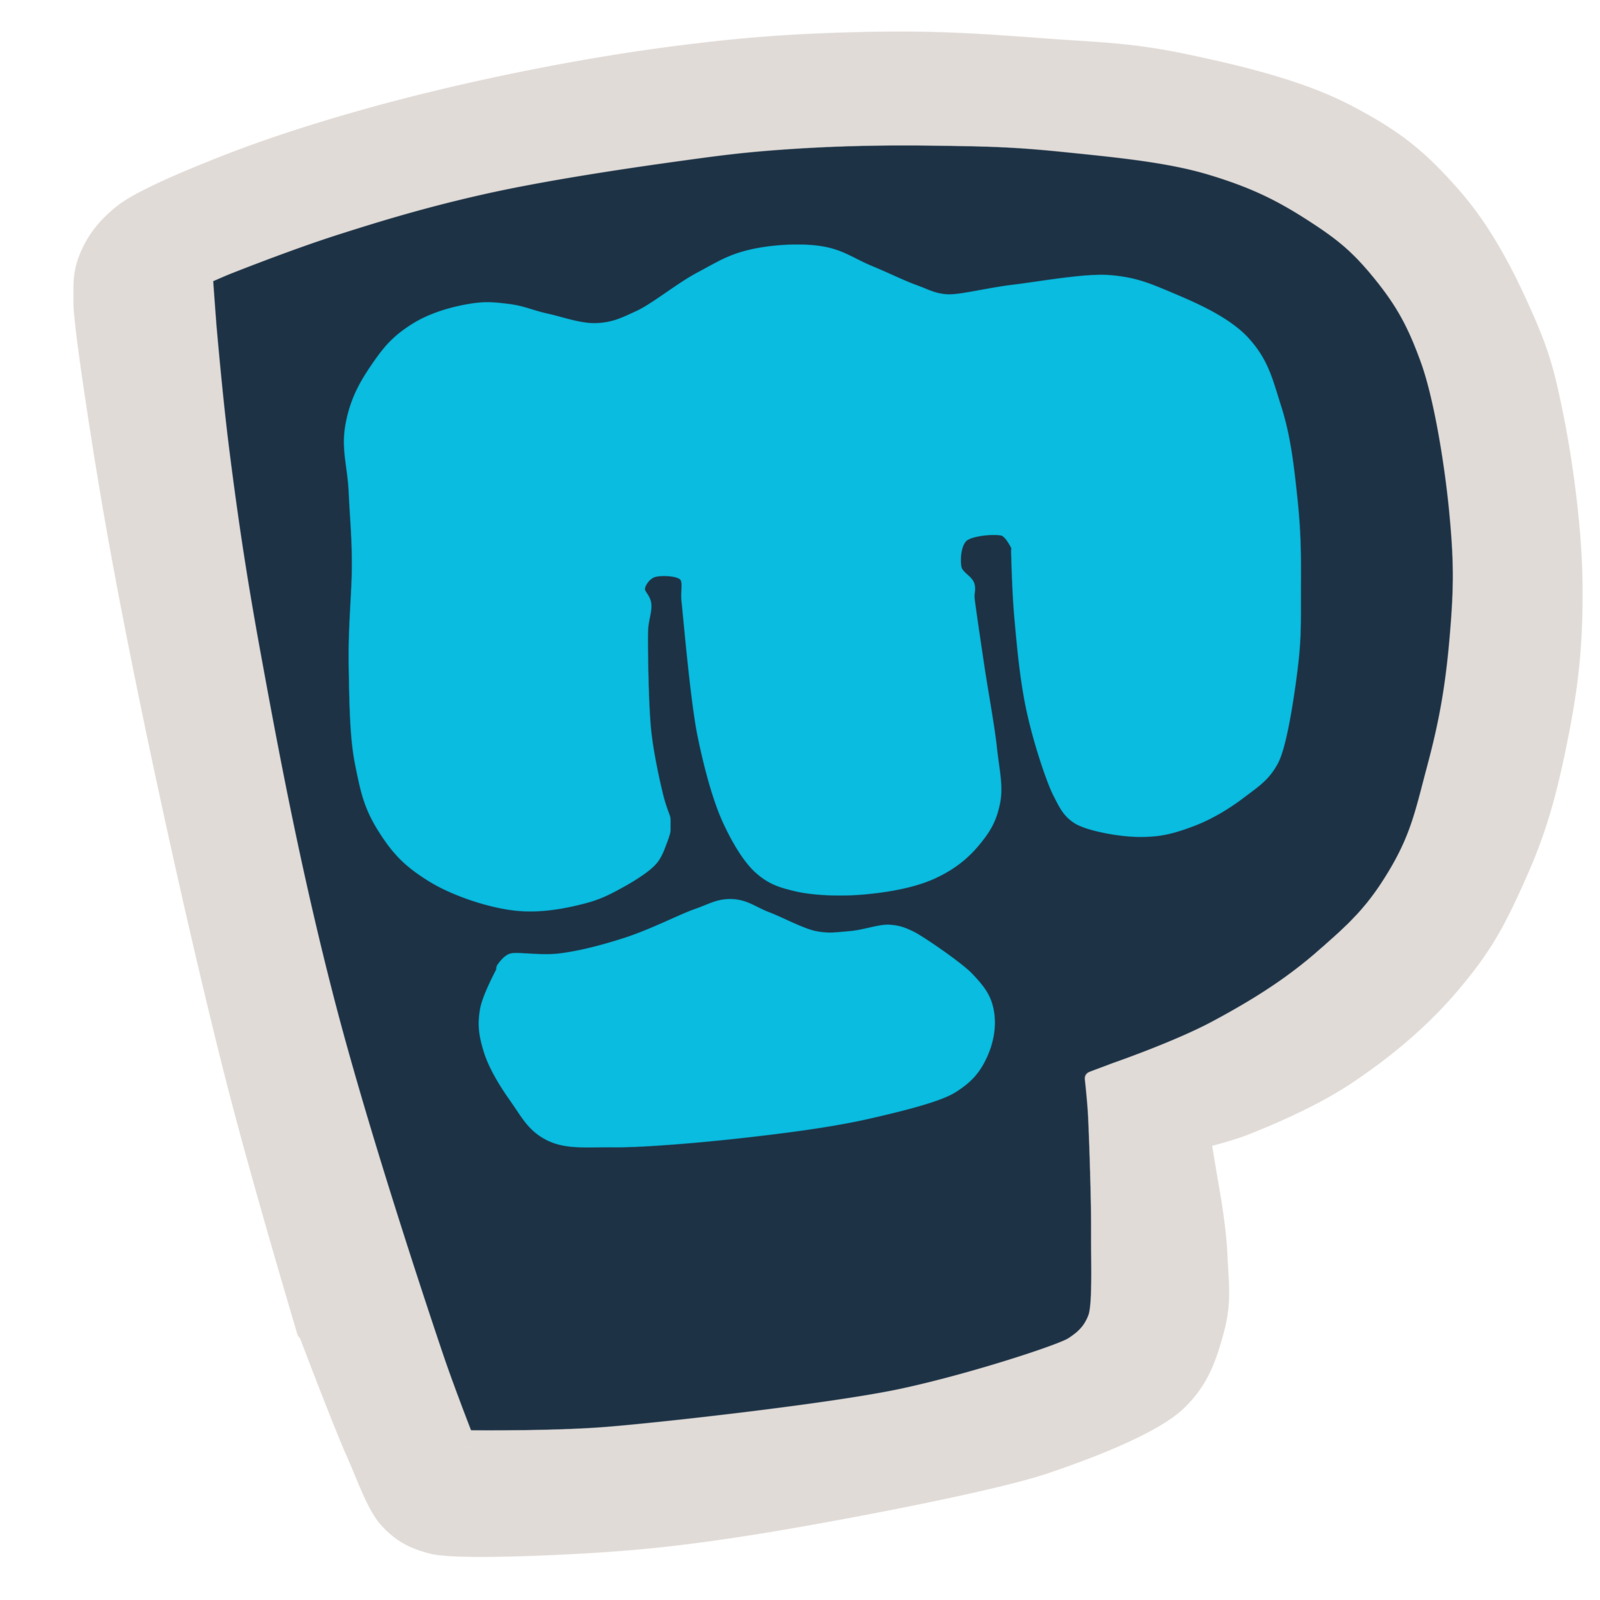 Pin by Tito on Для идей Pewdiepie, Vector logo, Logos